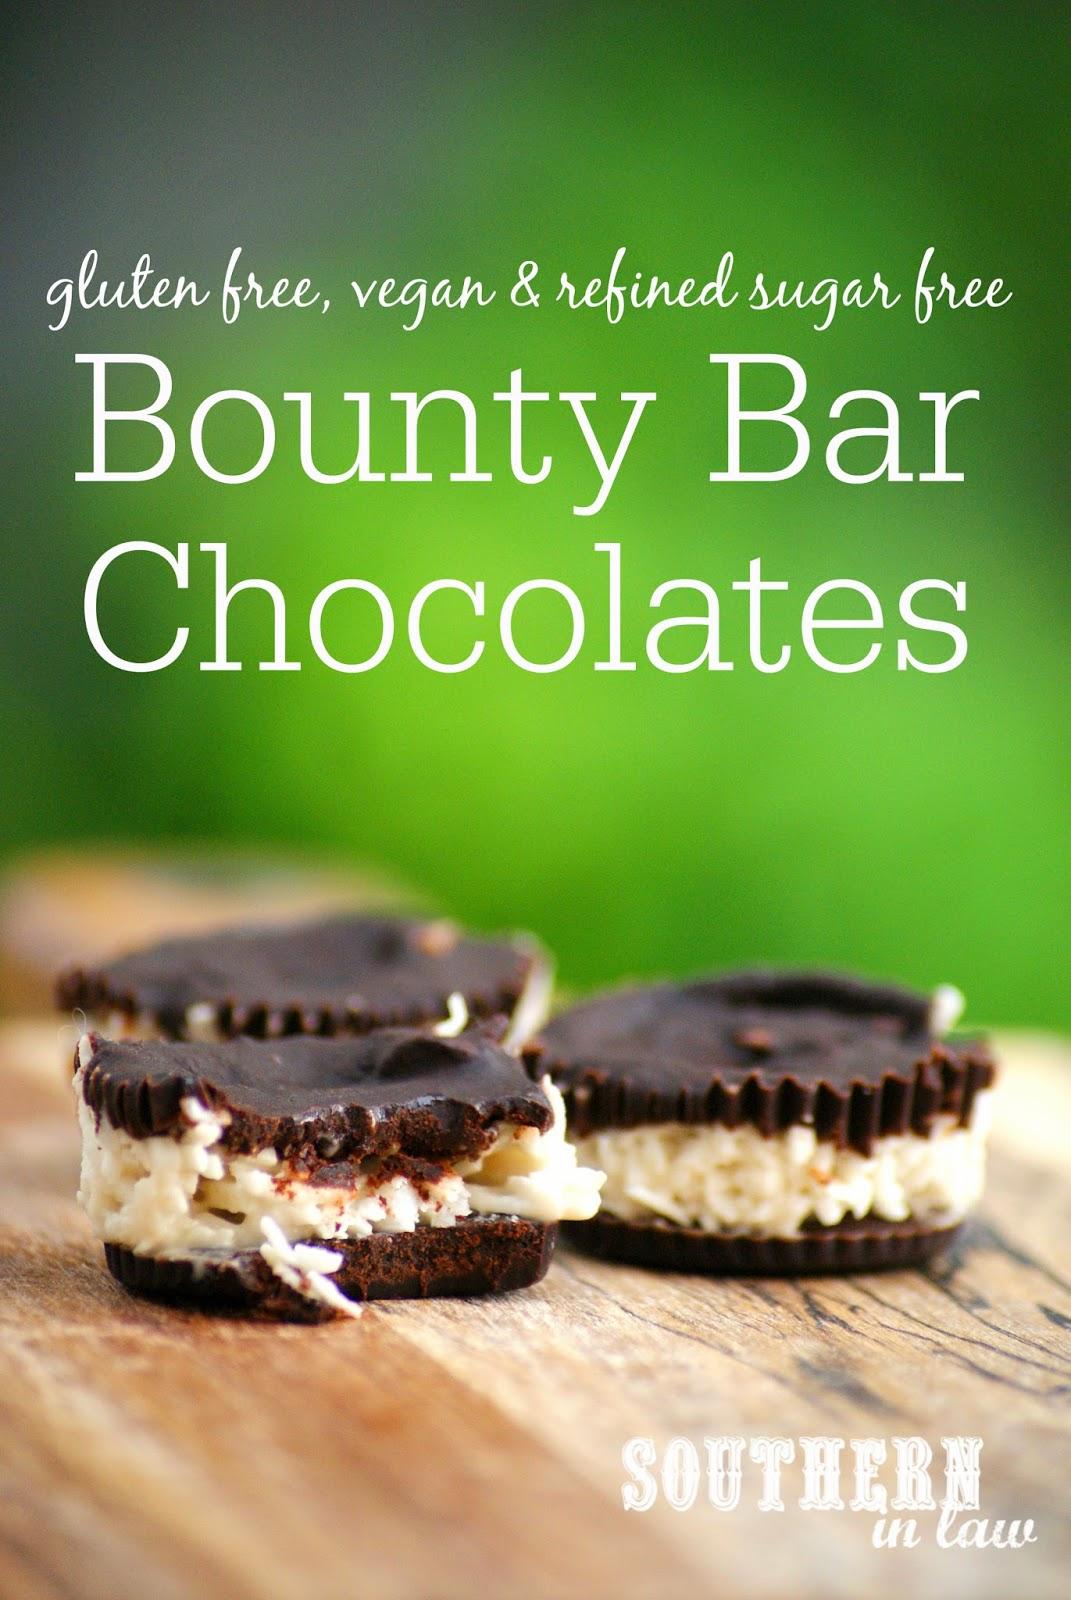 Homemade Vegan Bounty Bar Chocolate Cups Recipe - gluten free, refined sugar free, healthy, vegan, egg free, dairy free